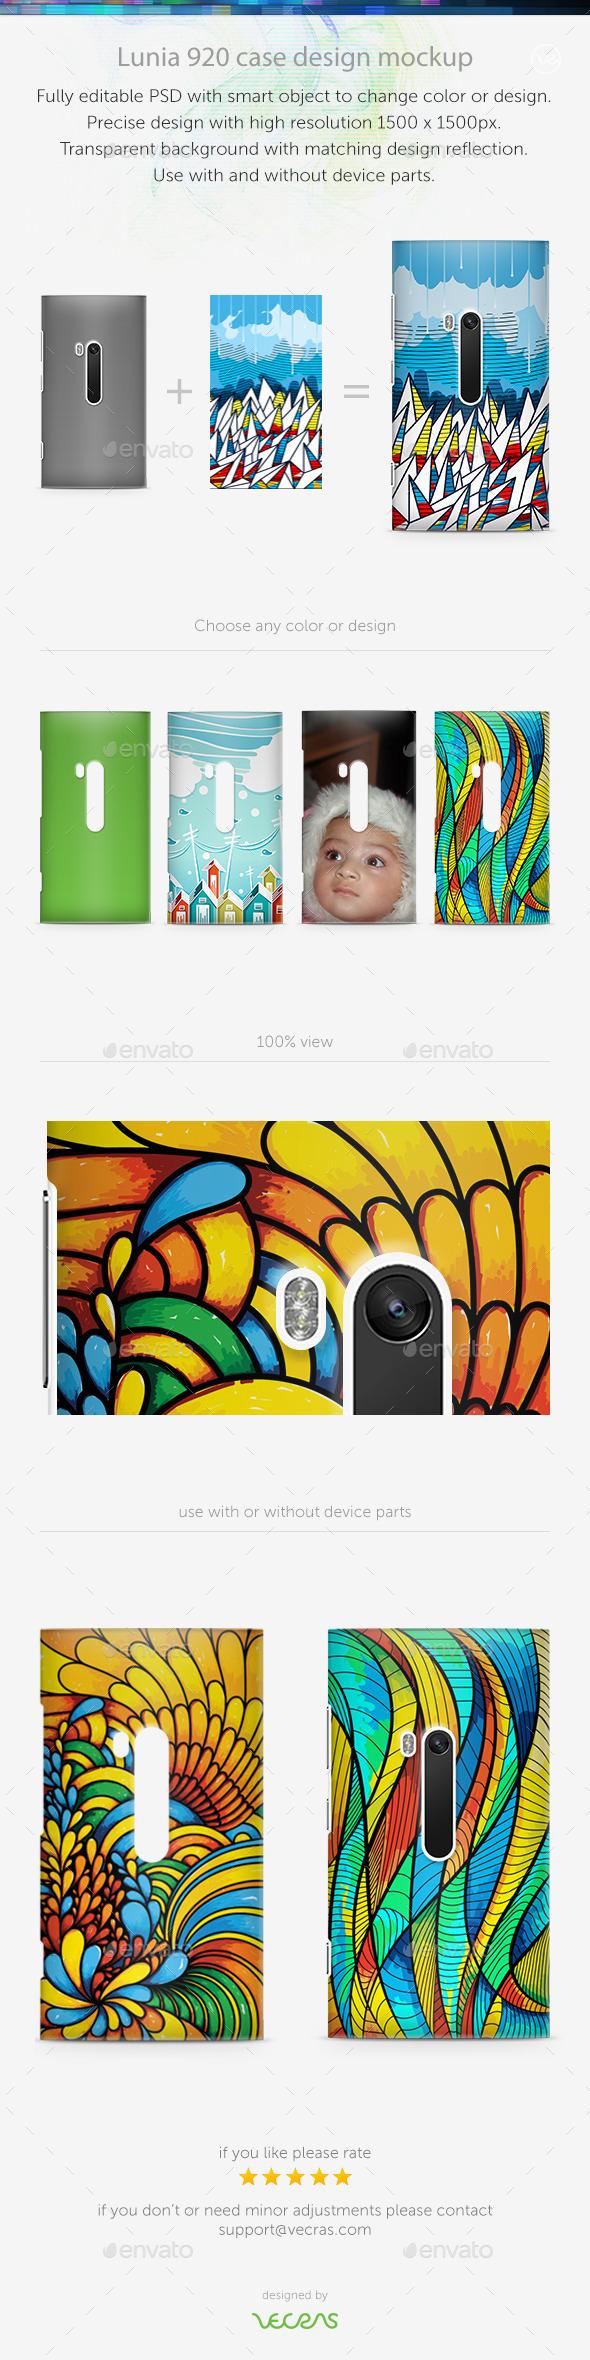 Lunia920 Case Design Mockup - Mobile Displays